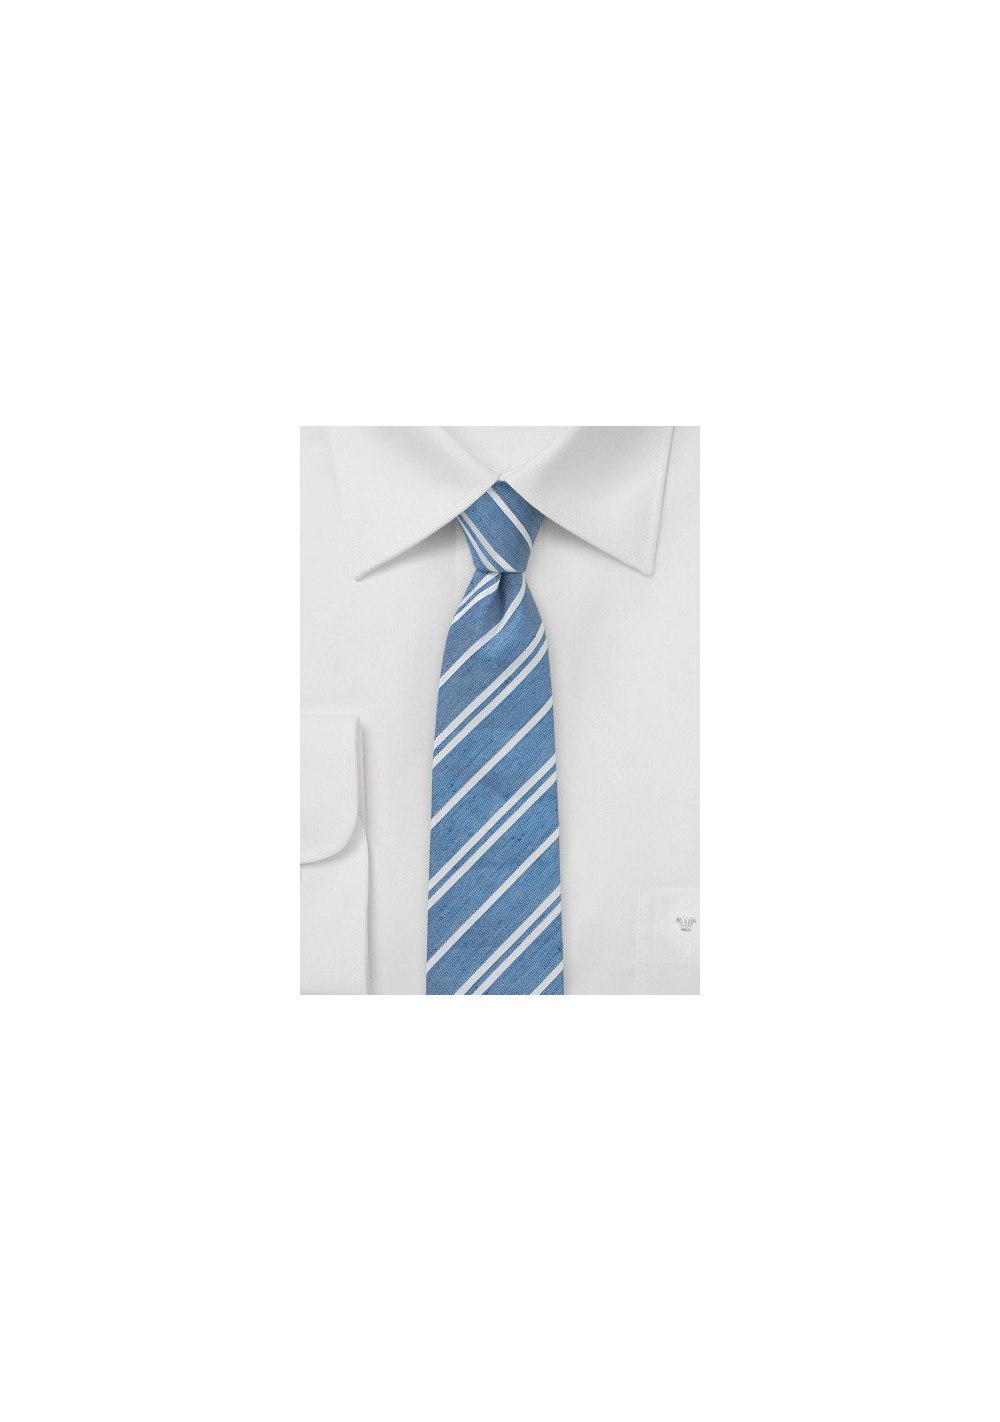 Light Blue Linen Necktie with Stripes